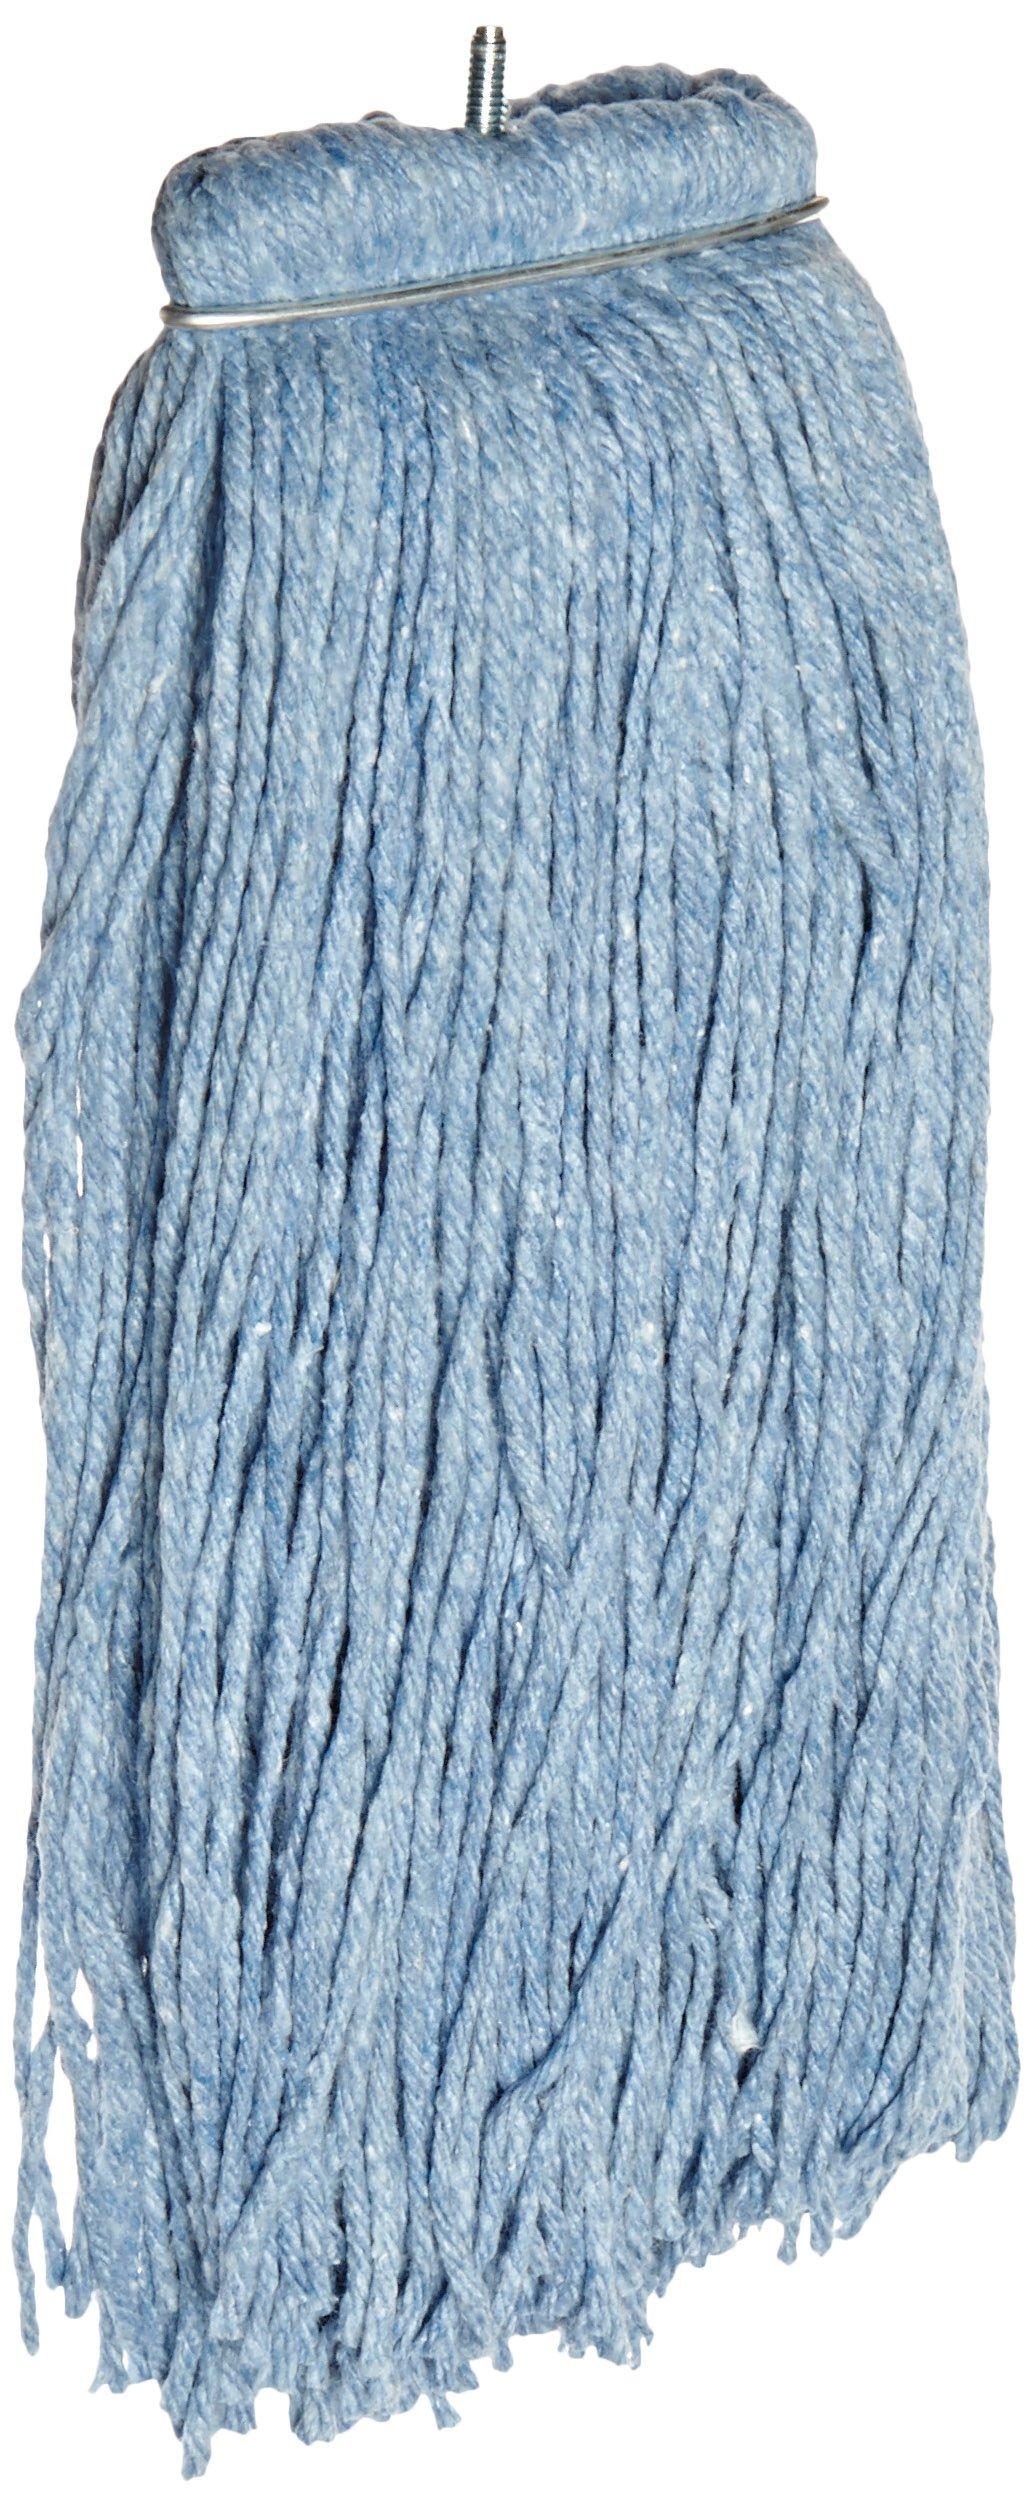 Impact 26120 Layflat Screw-Type Regular Cut-End Blend Wet Mop Head, 20 oz, Blue (Case of 12)